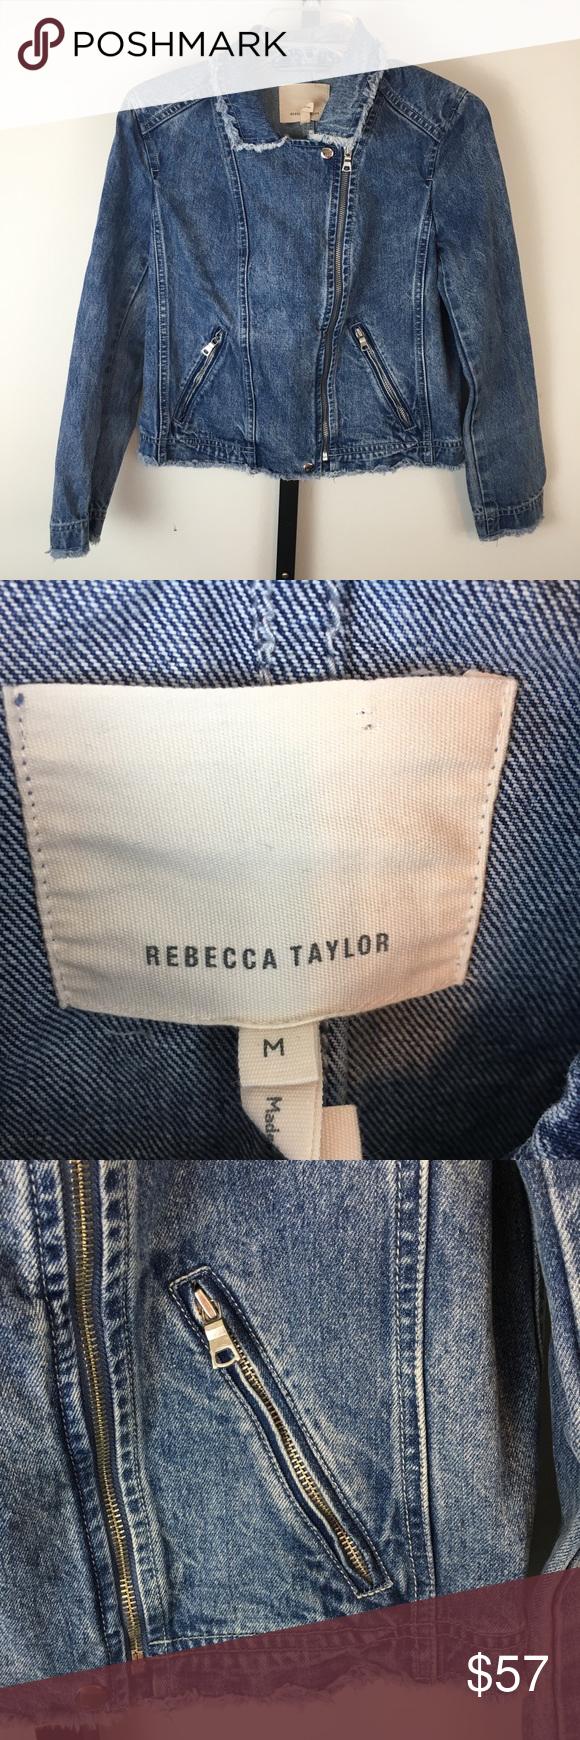 Rebecca Taylor Denim Moto Jacket M Blue Zip Front